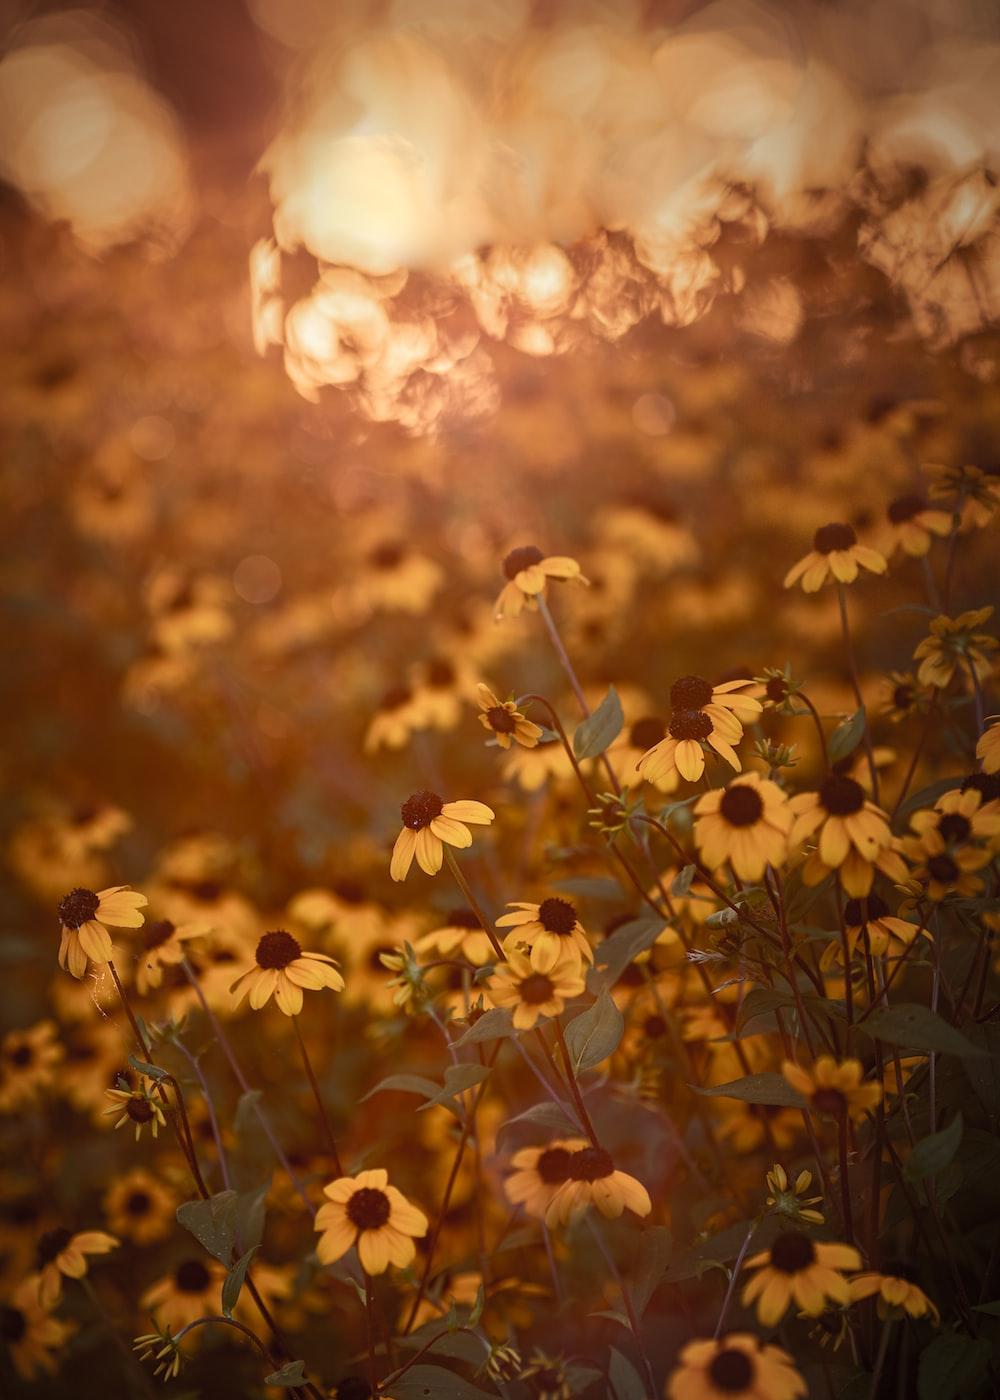 yellow flowers under orange sky